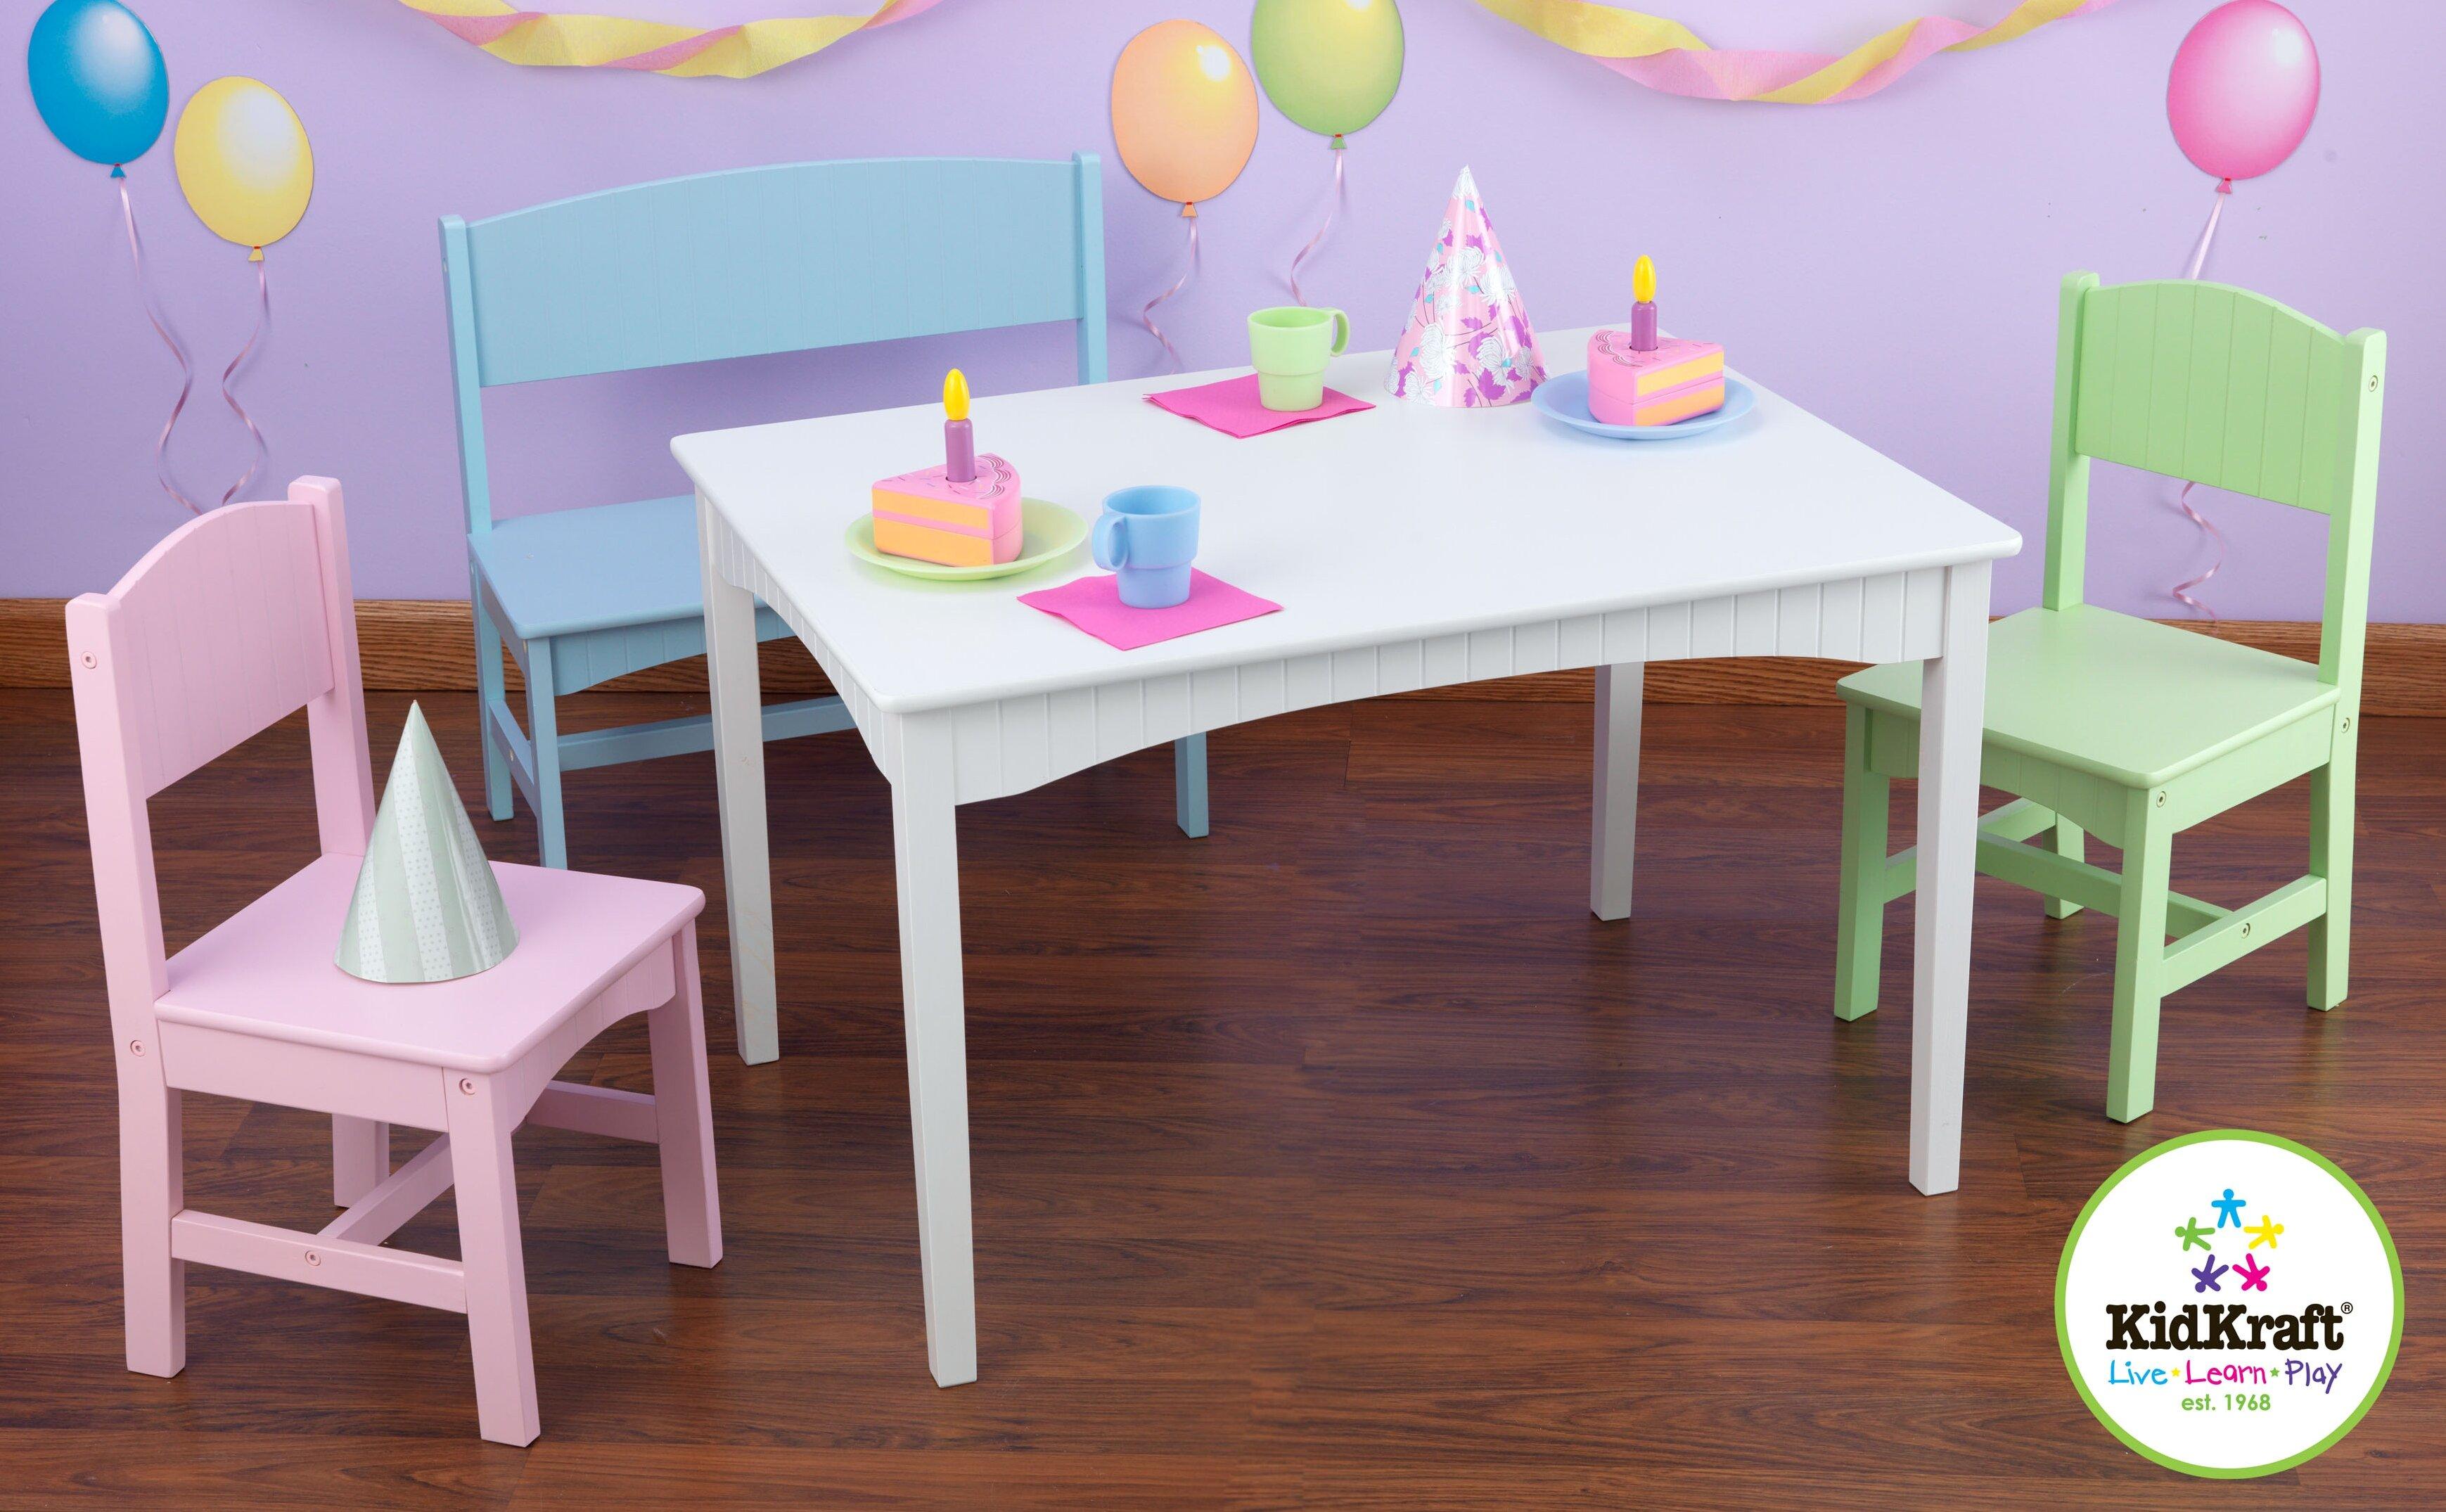 Awesome KidKraft Nantucket Kids 4 Piece Table And Chair Set U0026 Reviews | Wayfair